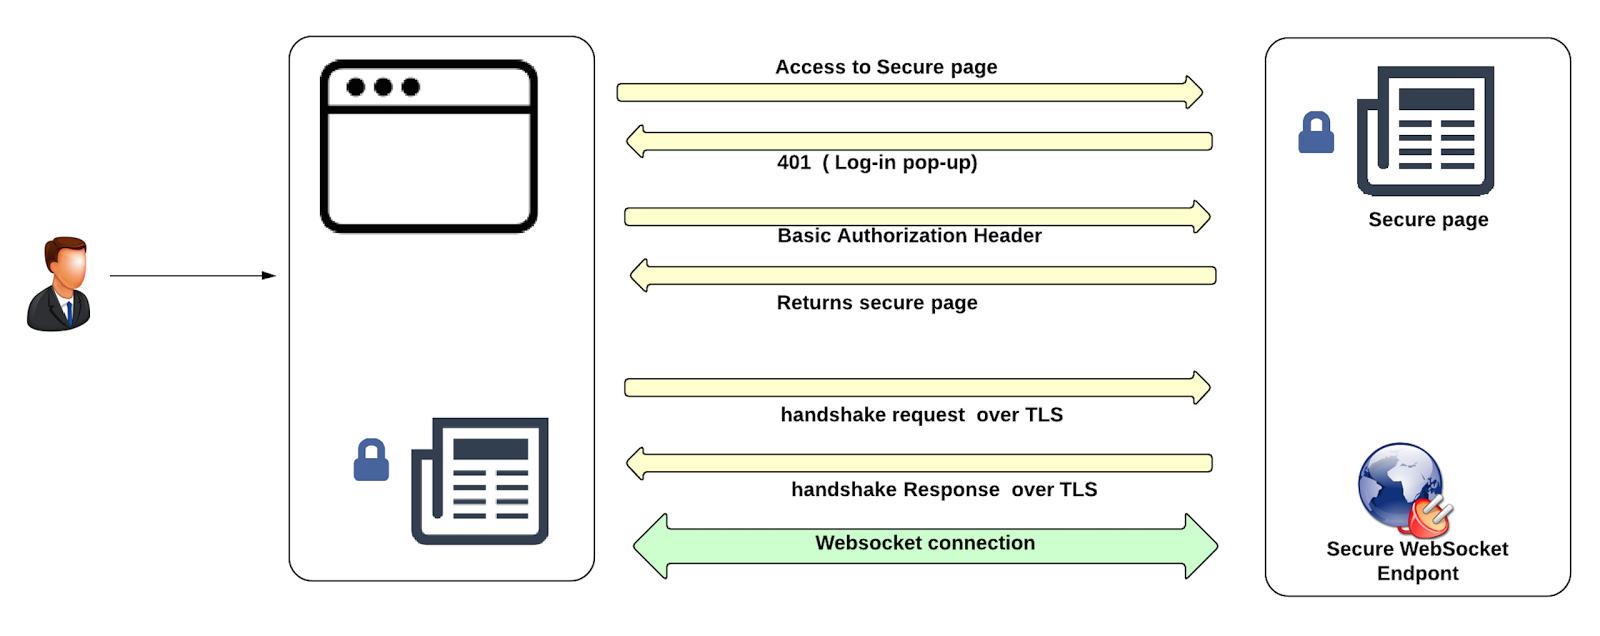 sagara's Blog: WebSocket security patterns